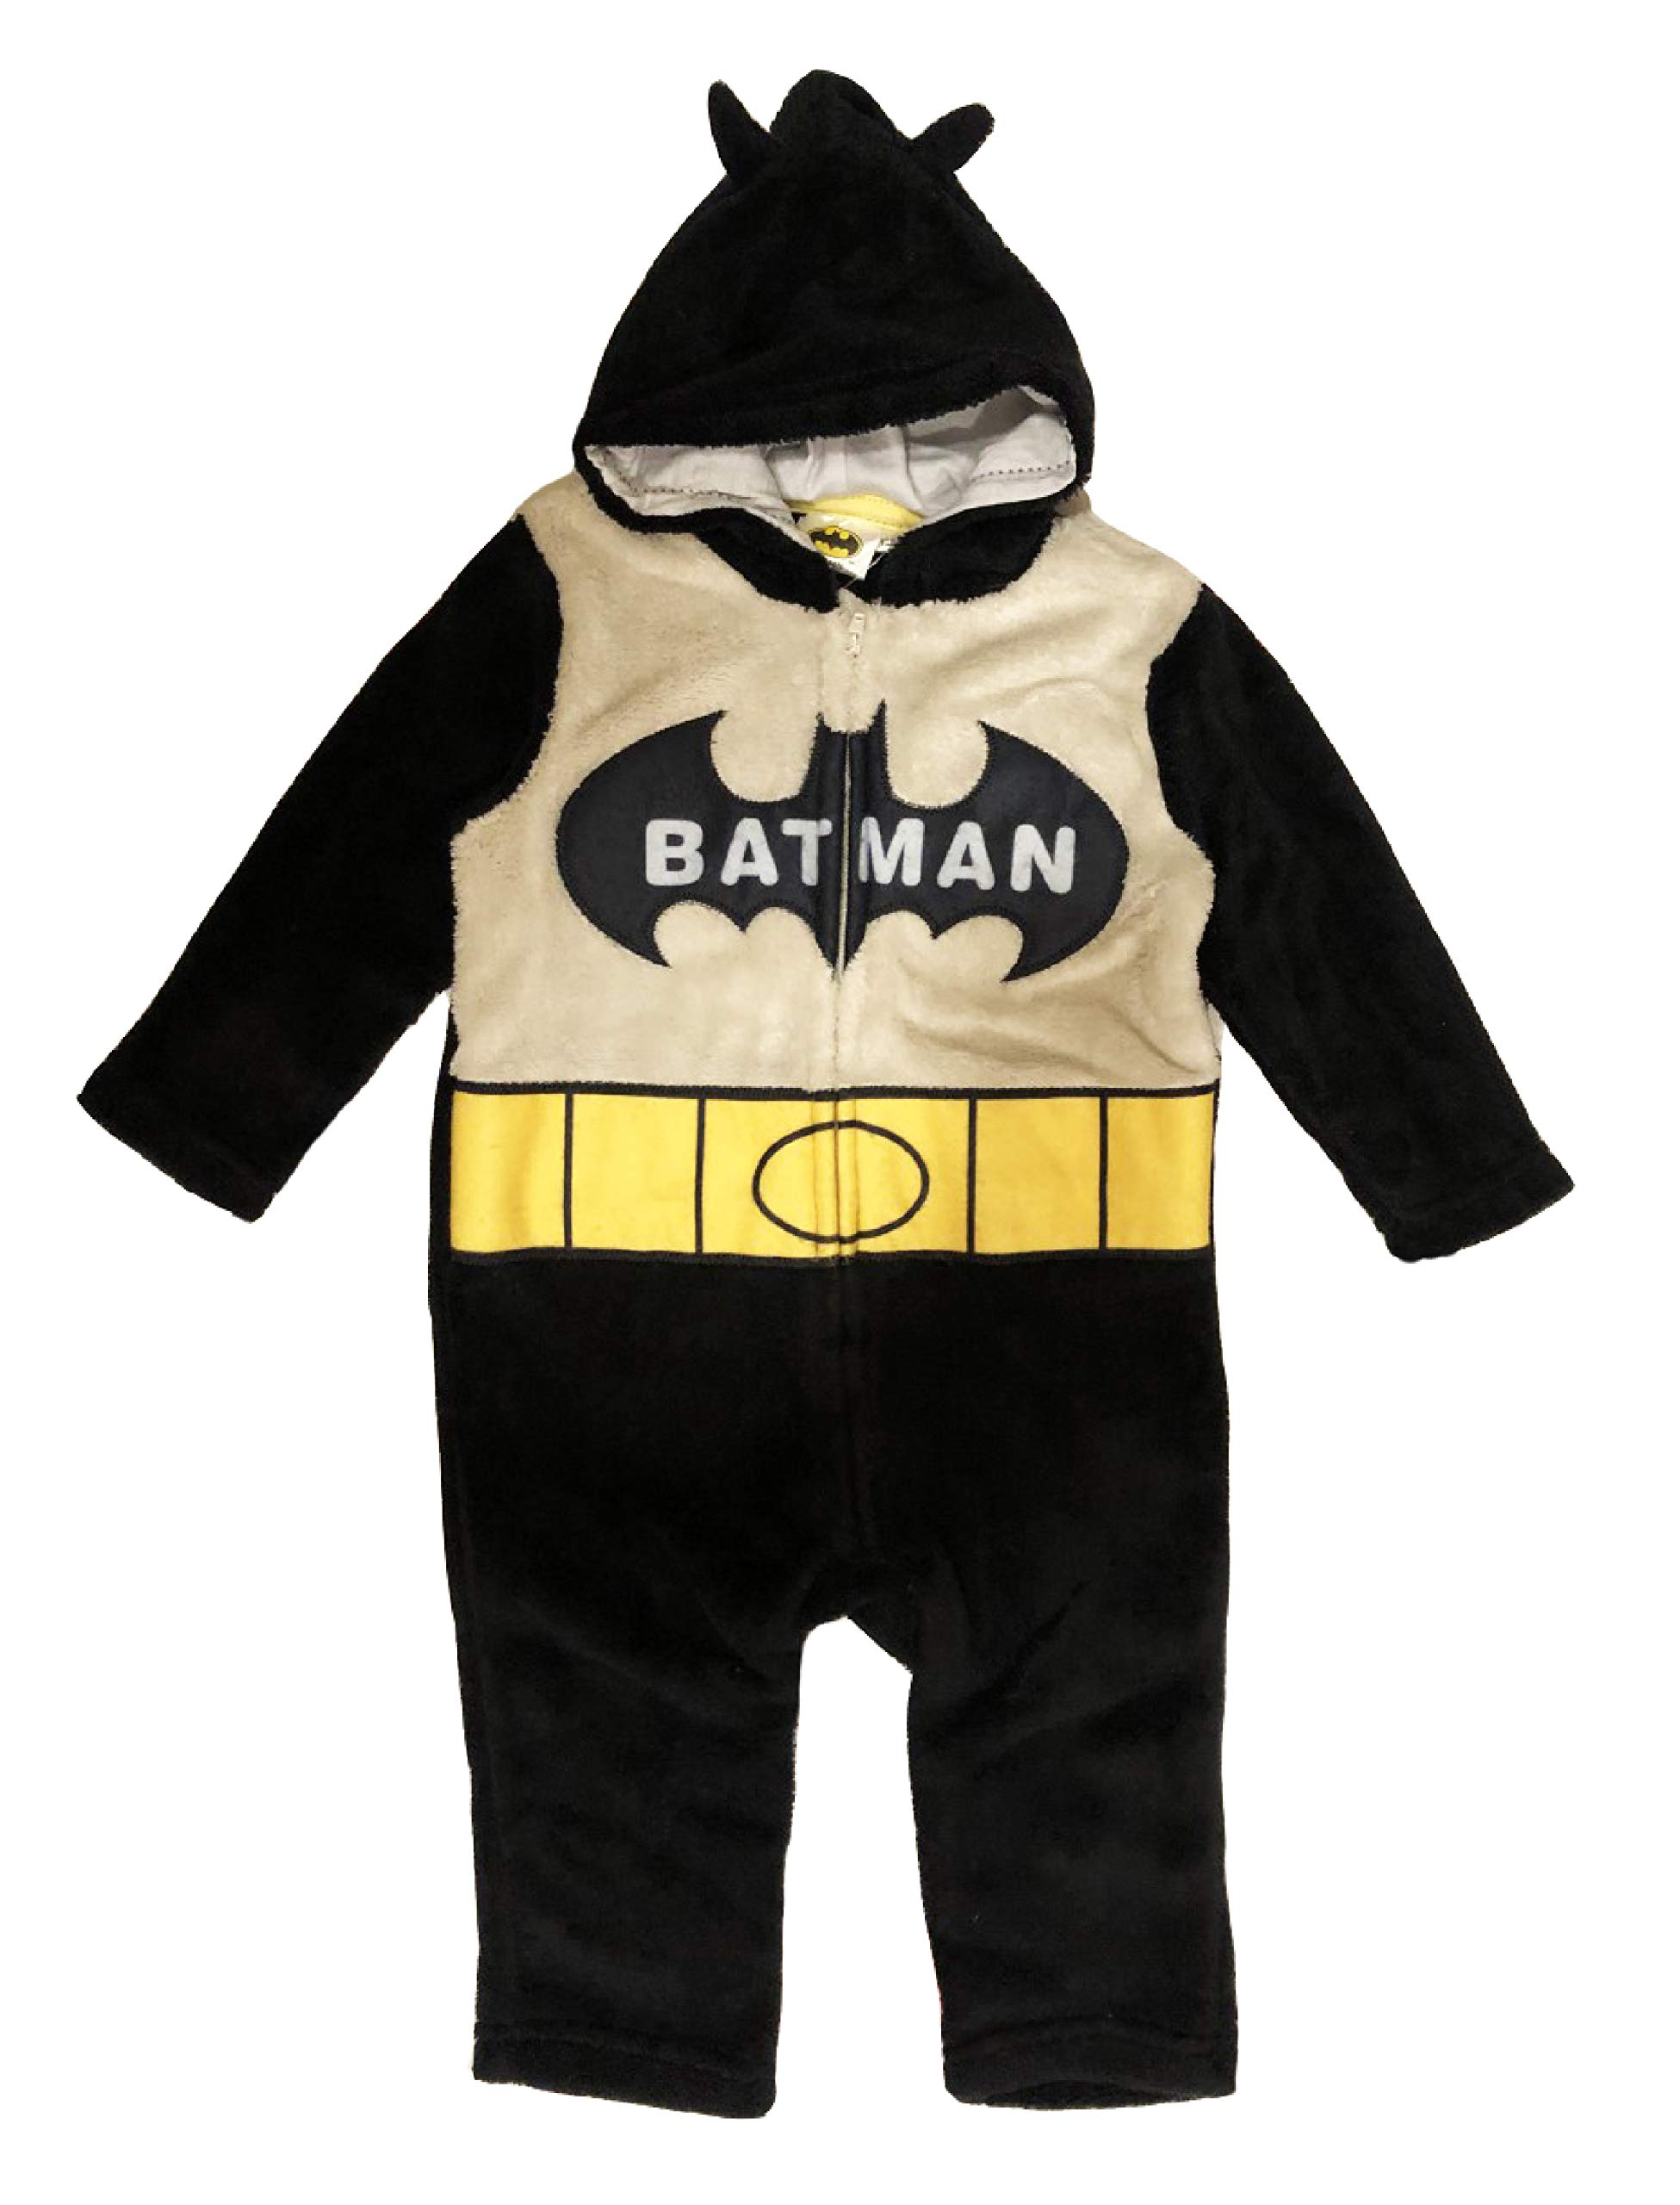 batman vs superman Pijama completo 12 18 24 36 meses invierno 2021 1